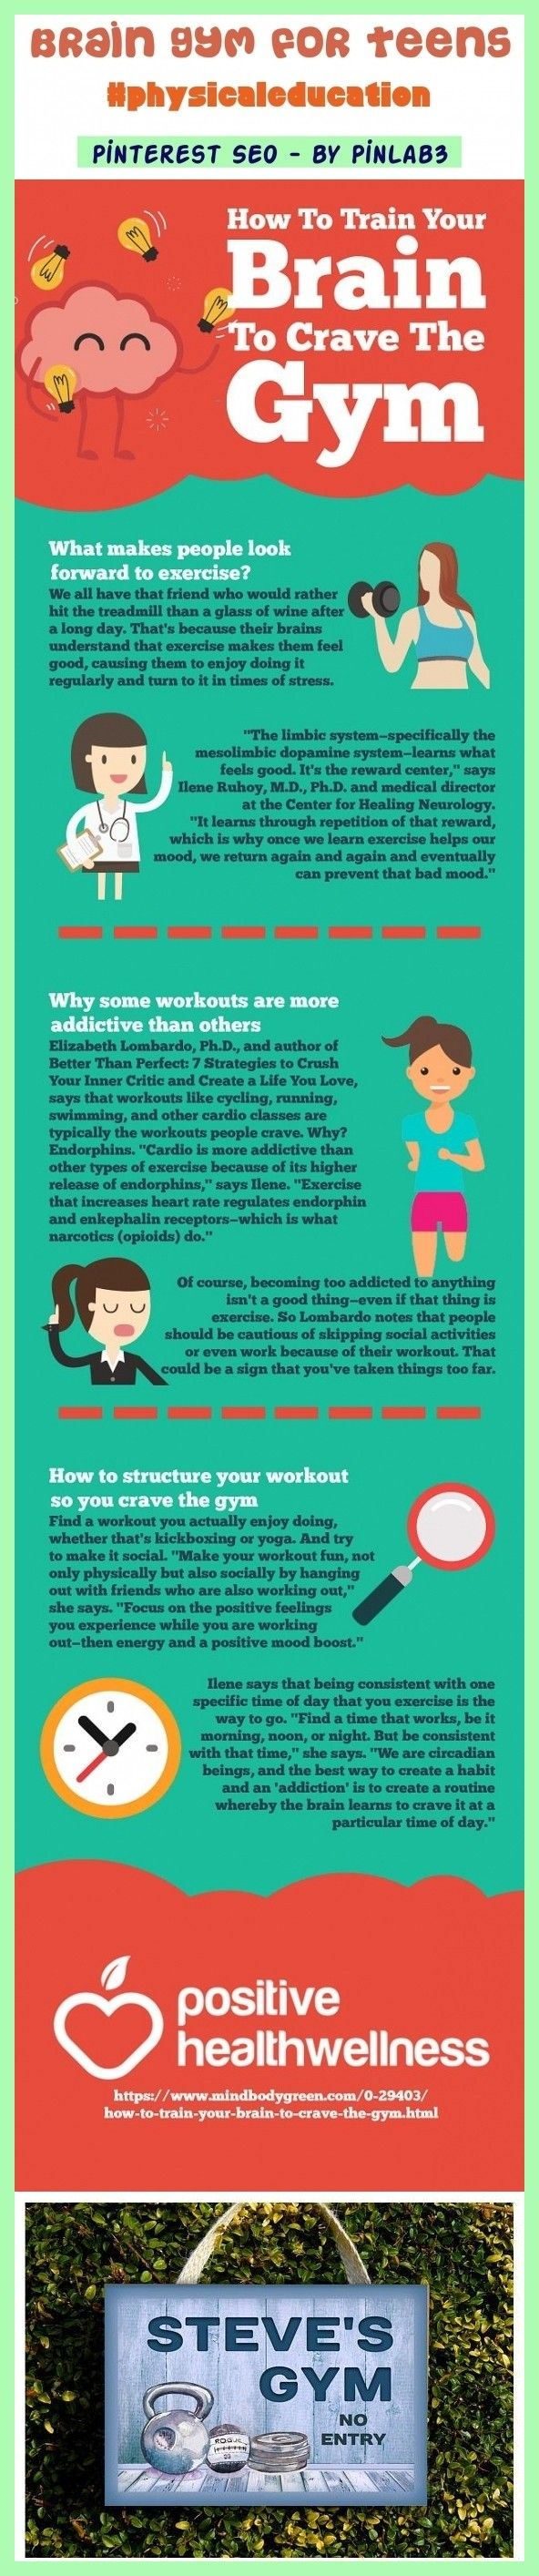 Brain gym for teens brain teens Brain Gym für